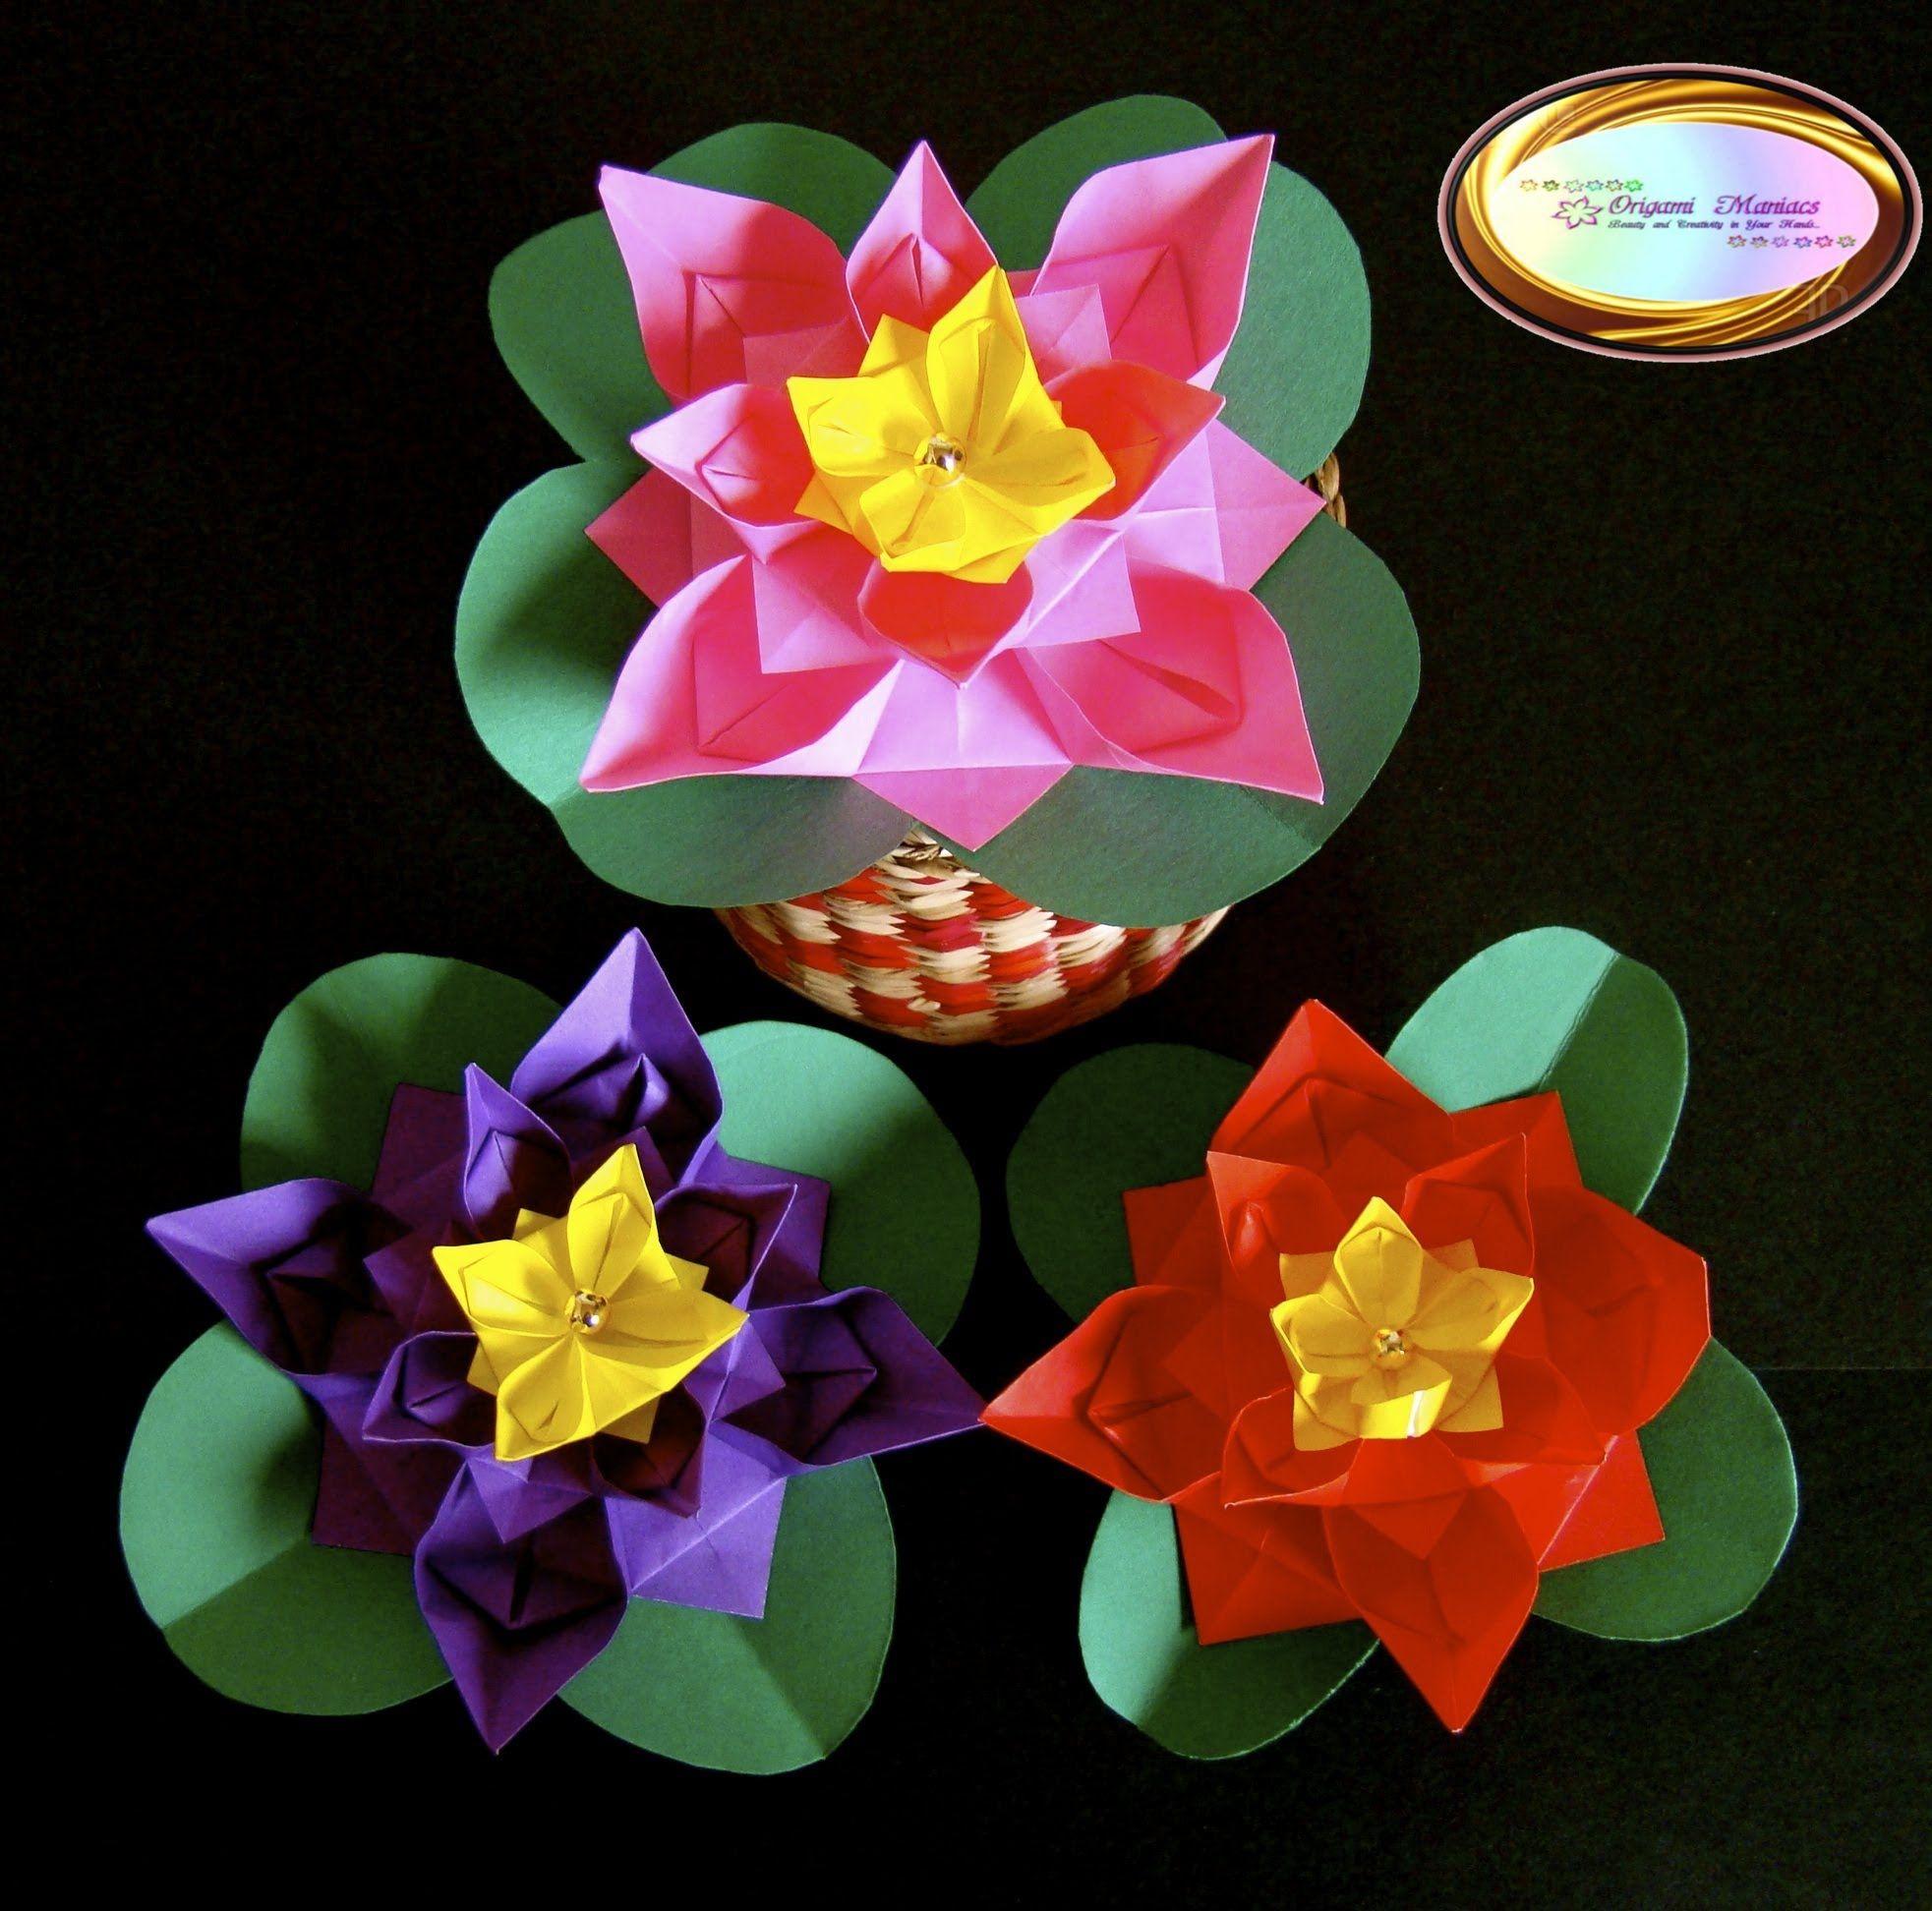 Origami maniacs 122 cute origami flower origami pinterest origami maniacs 122 cute origami flower mightylinksfo